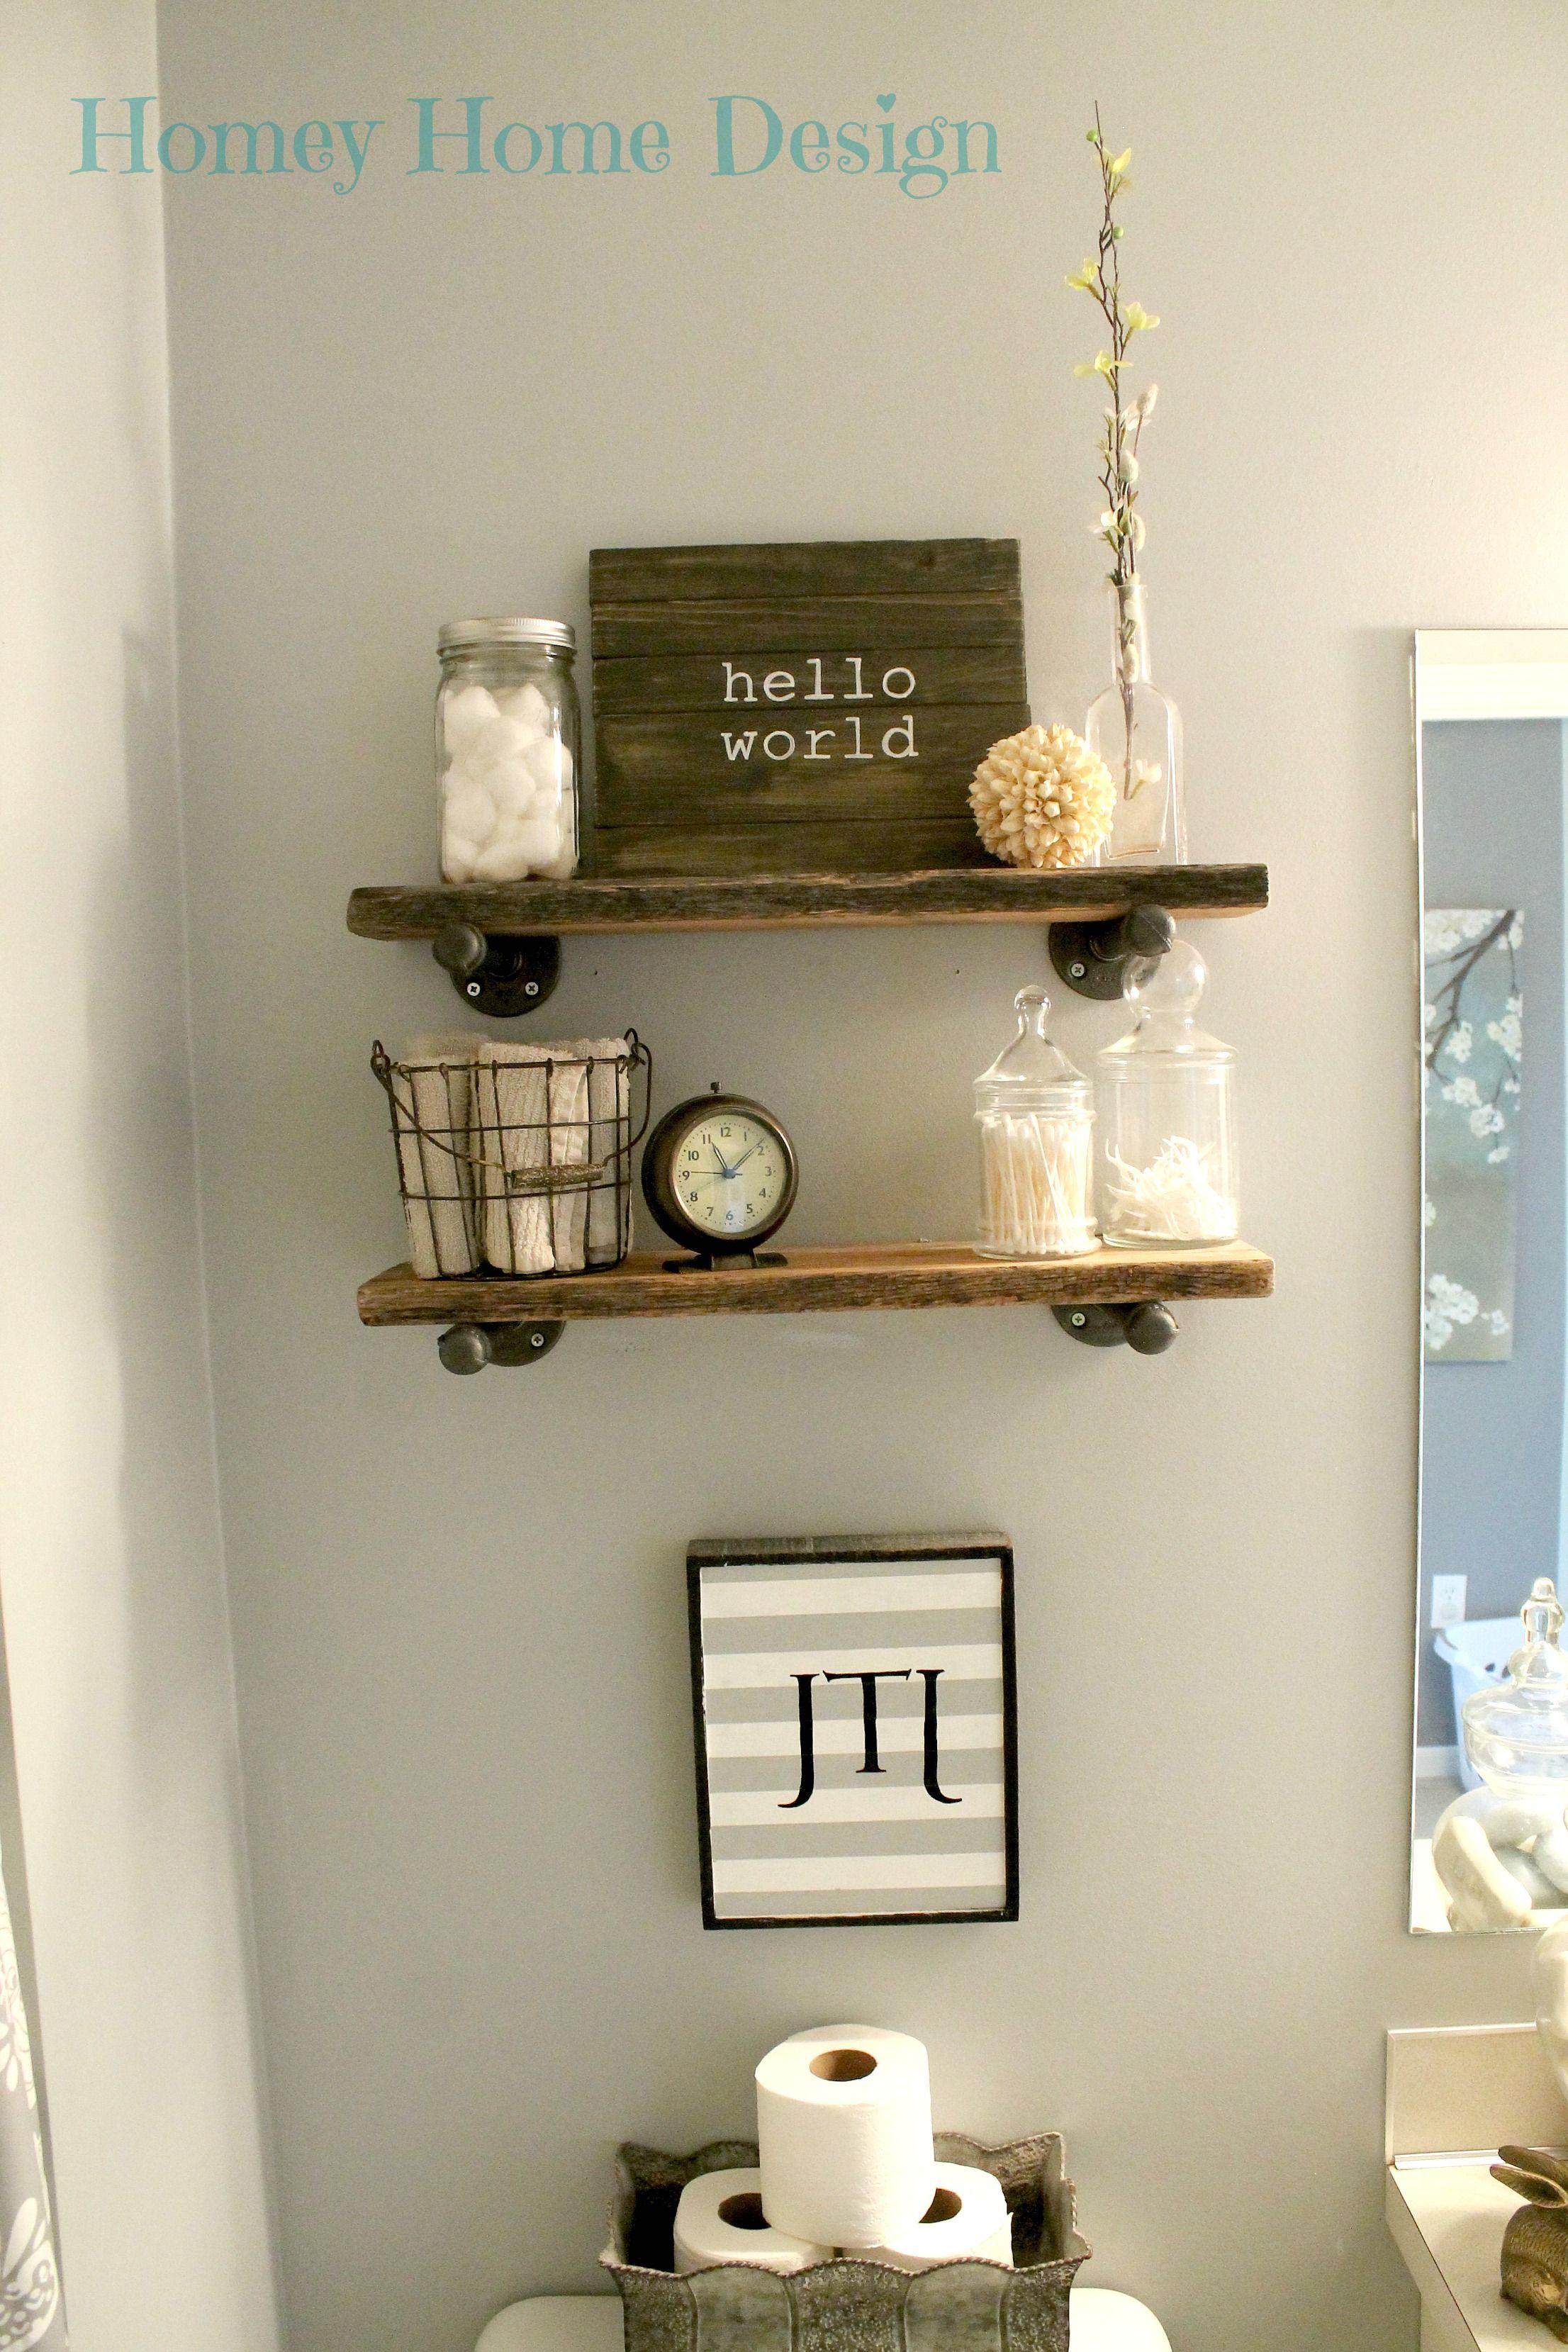 Homey Home Design Bathroom barnwood shelving | India home ...